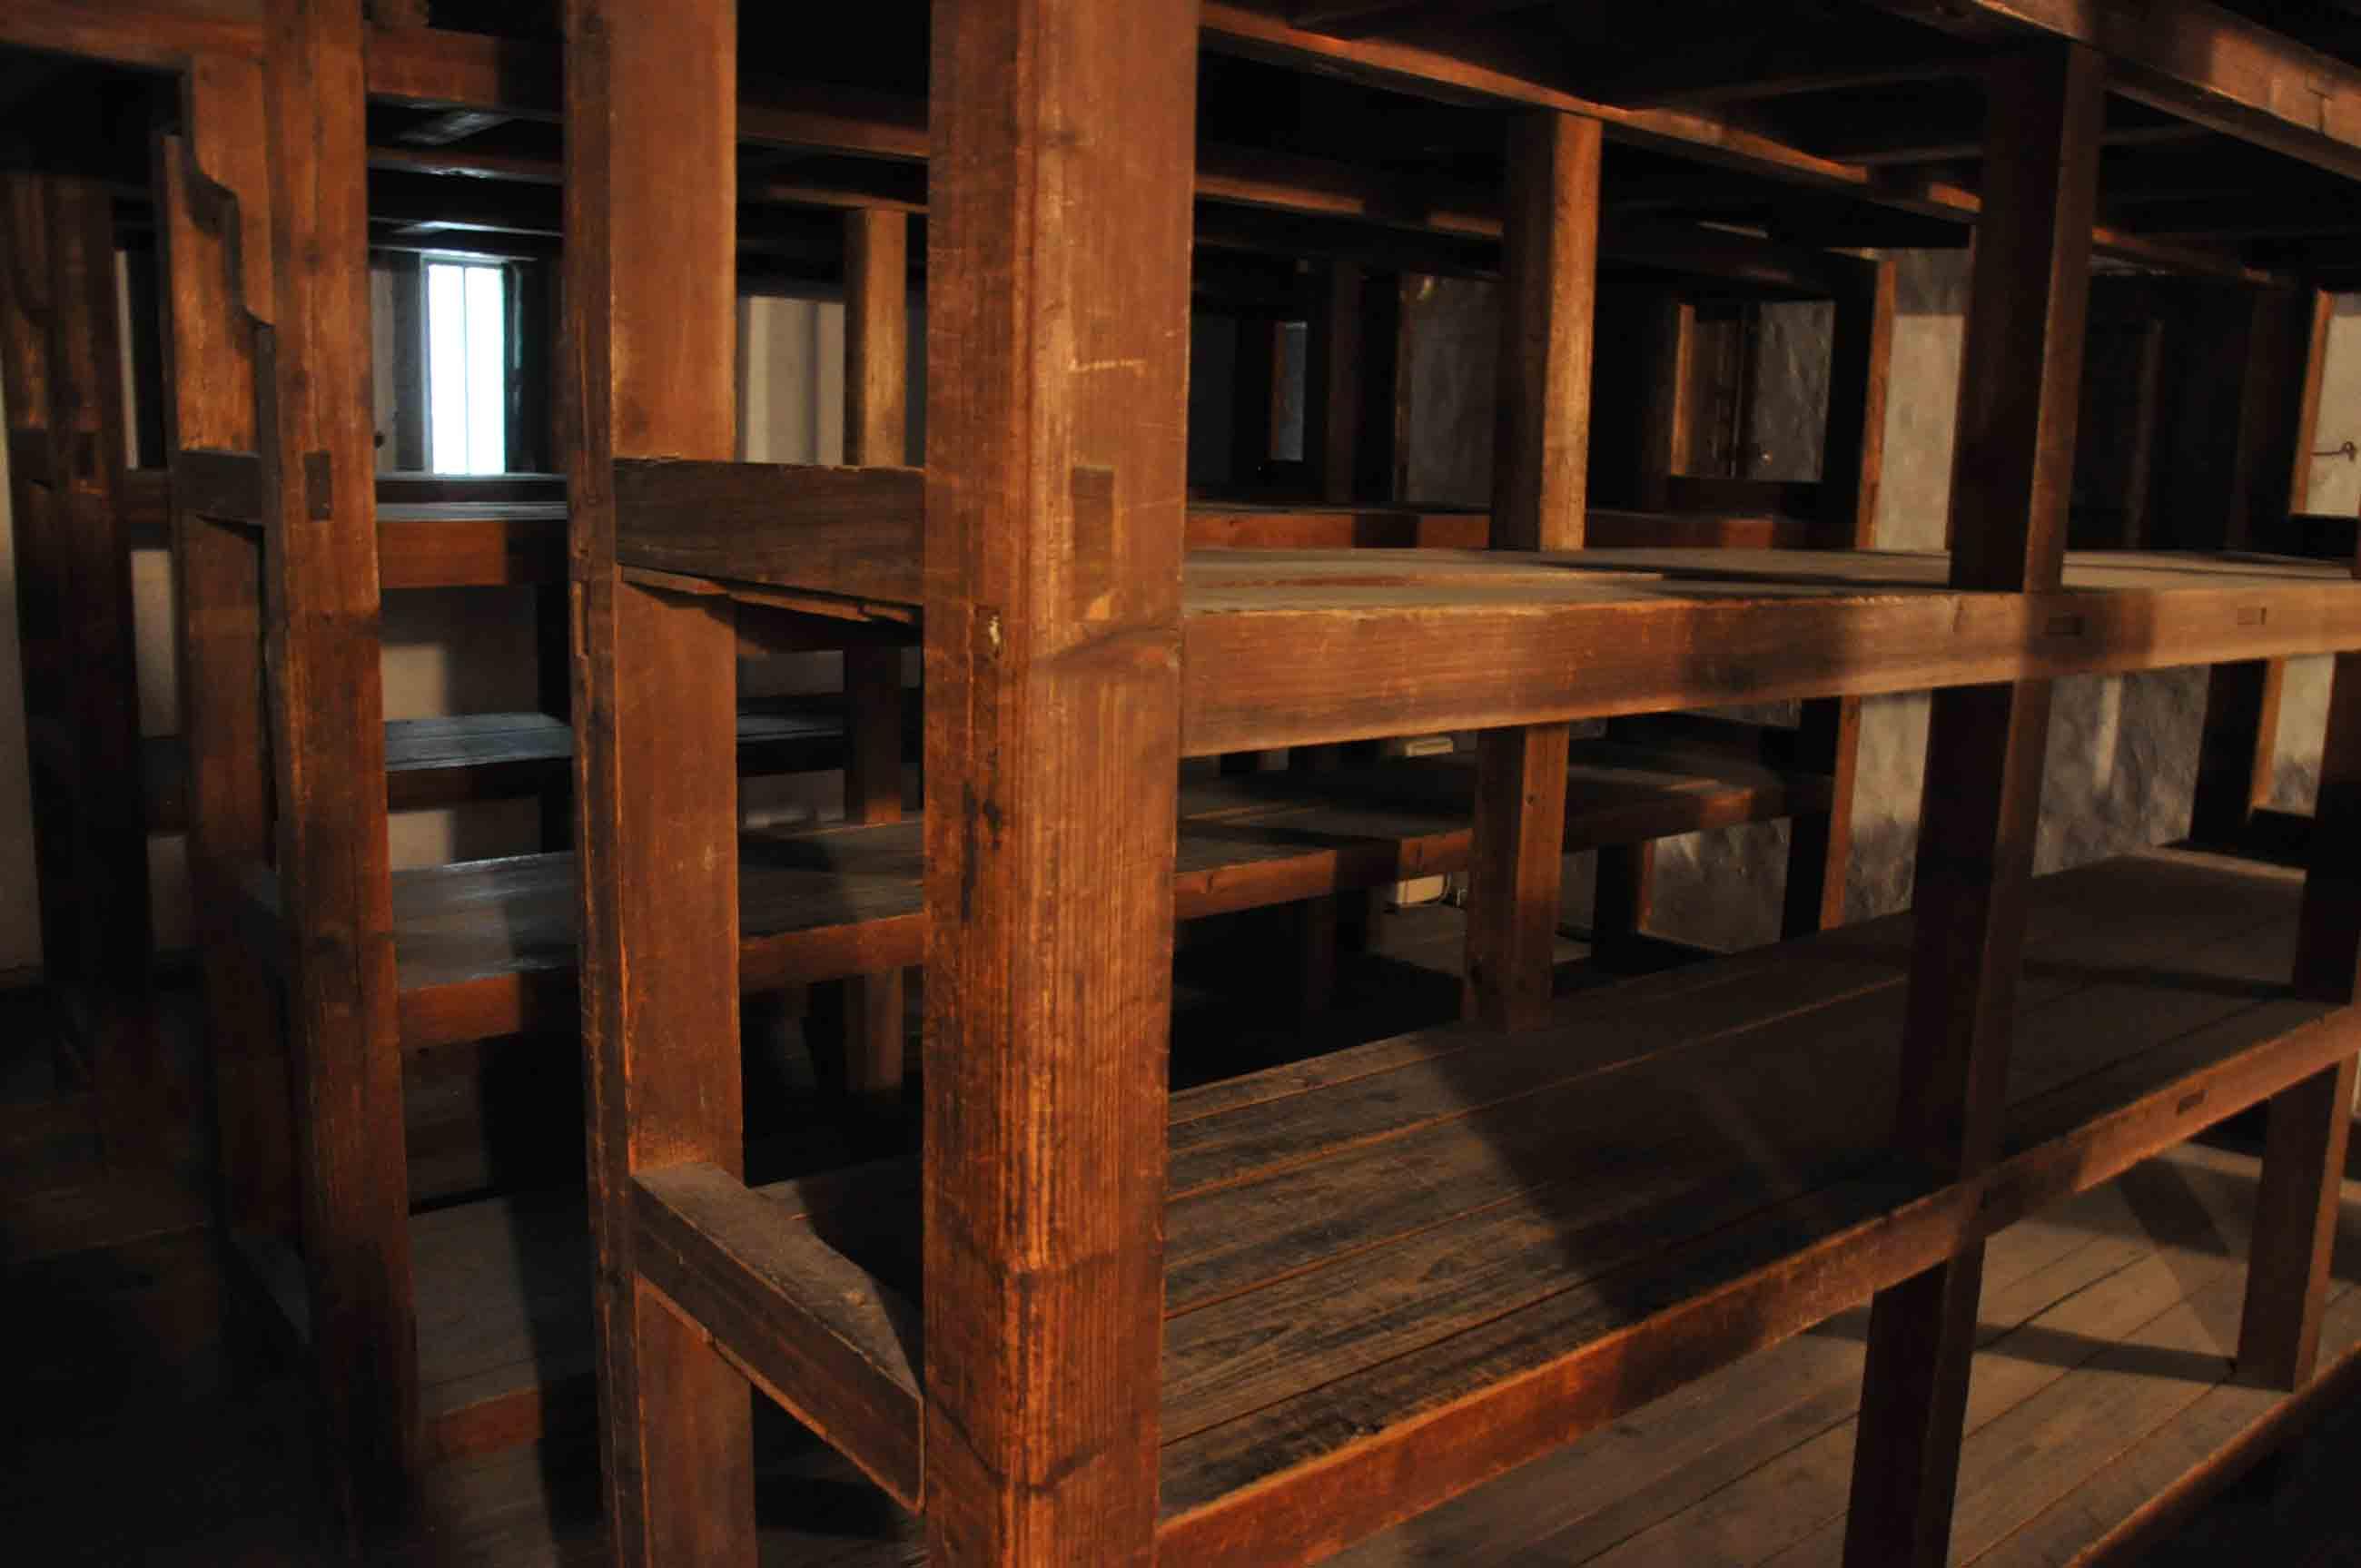 Tak Sang On Pawnshop storeroom shelves